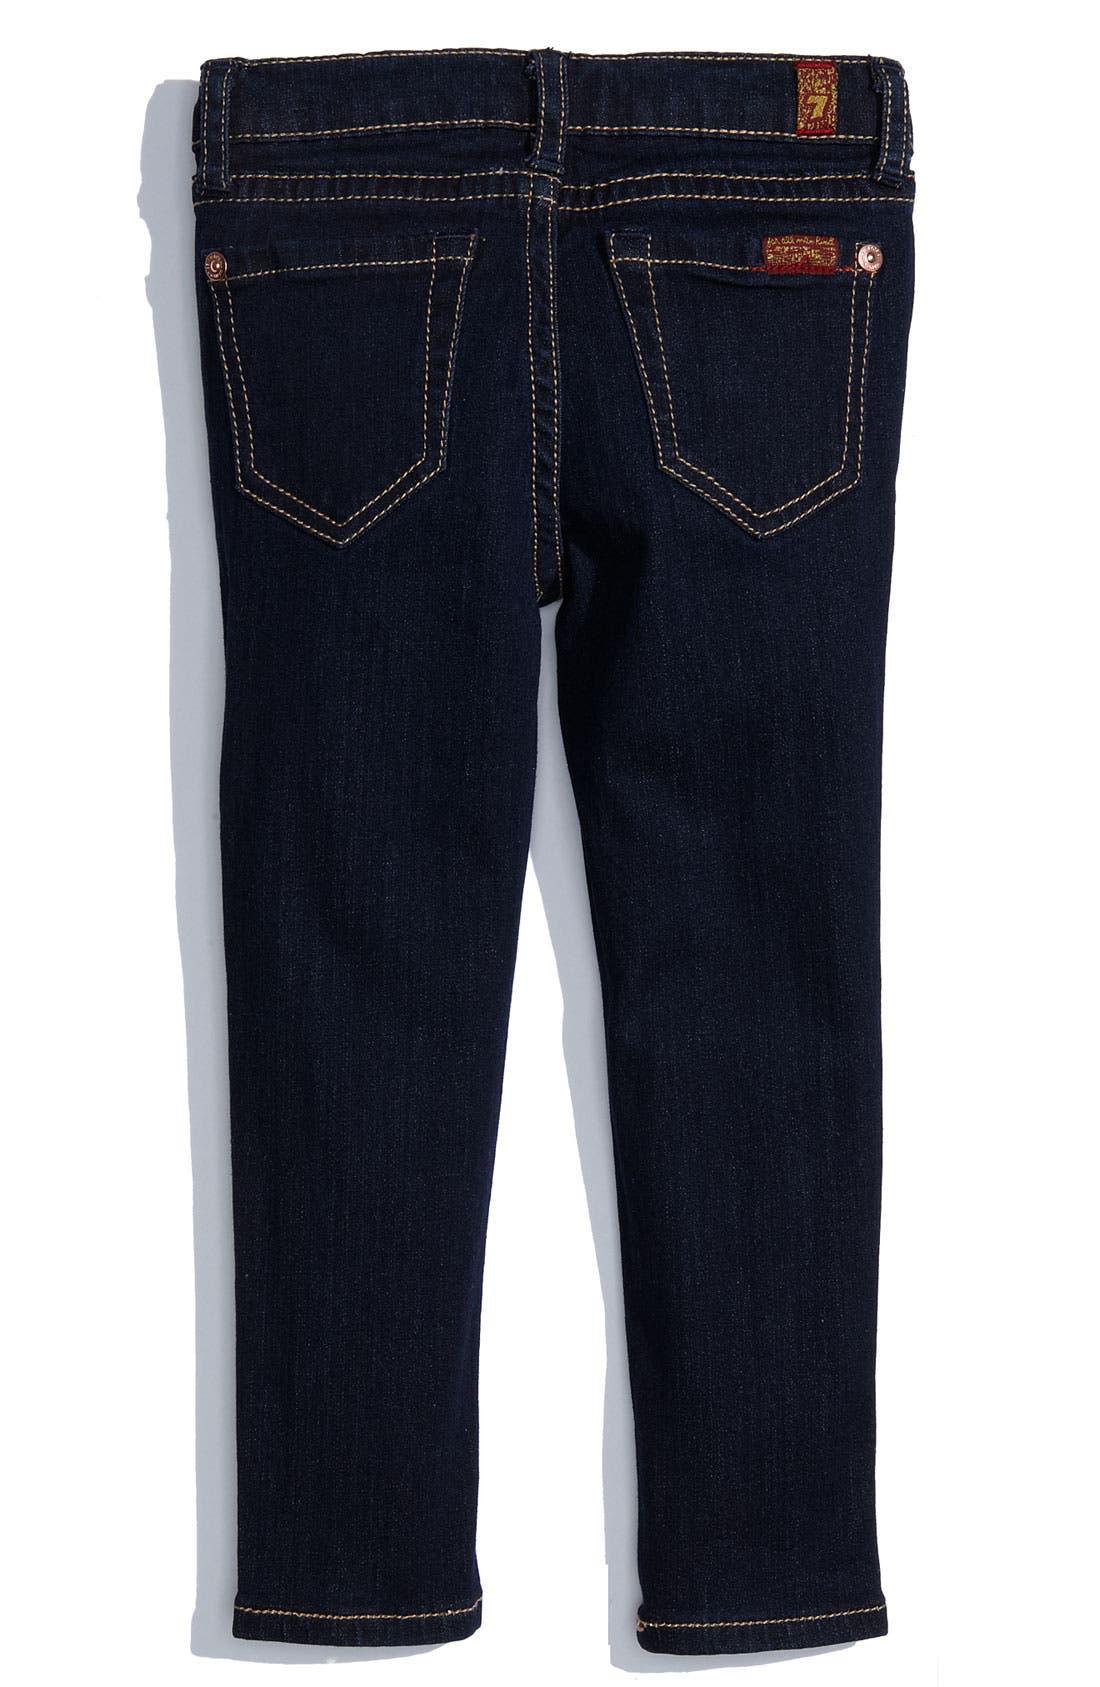 Alternate Image 1 Selected - 7 For All Mankind® Skinny Denim Jeans (Toddler)